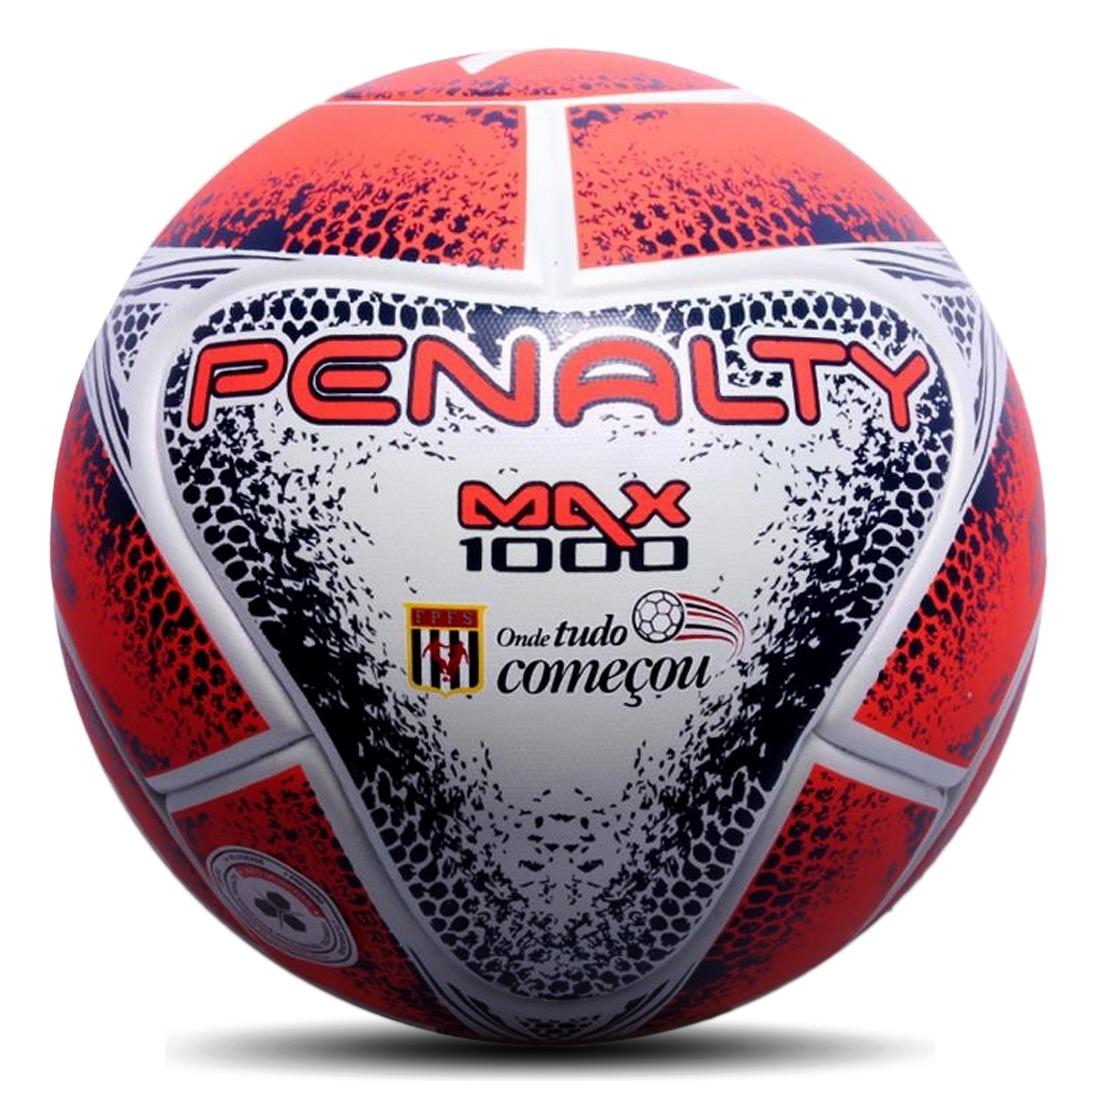 ef500b51eb bola futsal penalty max 1000 aprovada fifa na caixa. Carregando zoom.